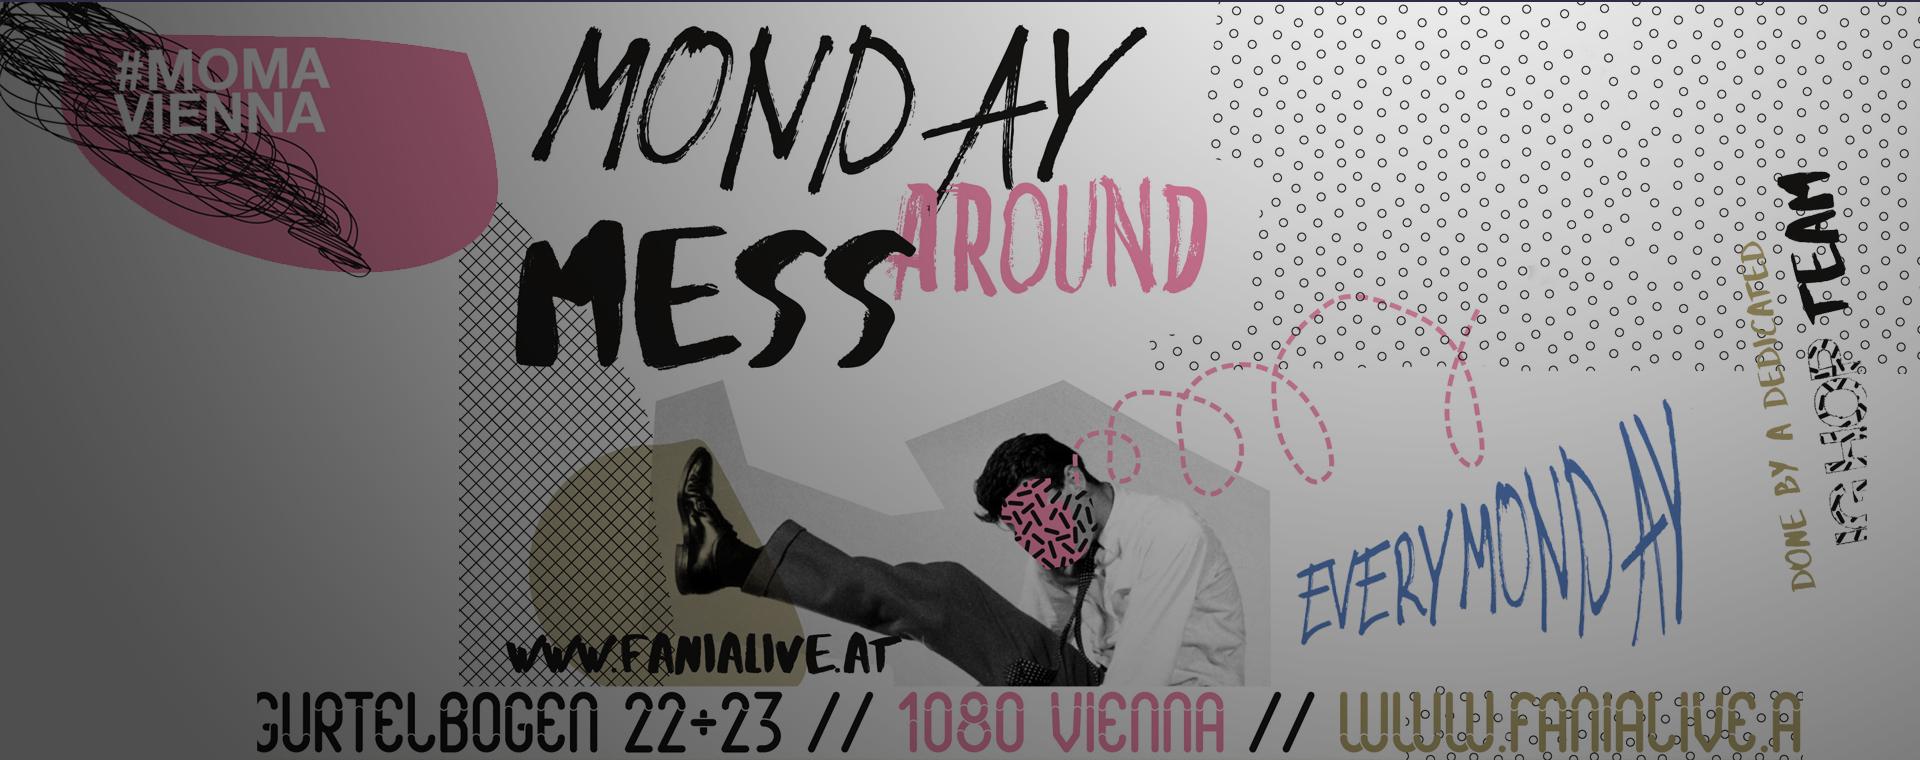 Monday-Mess-Around-Every-Monday-Fania-Live